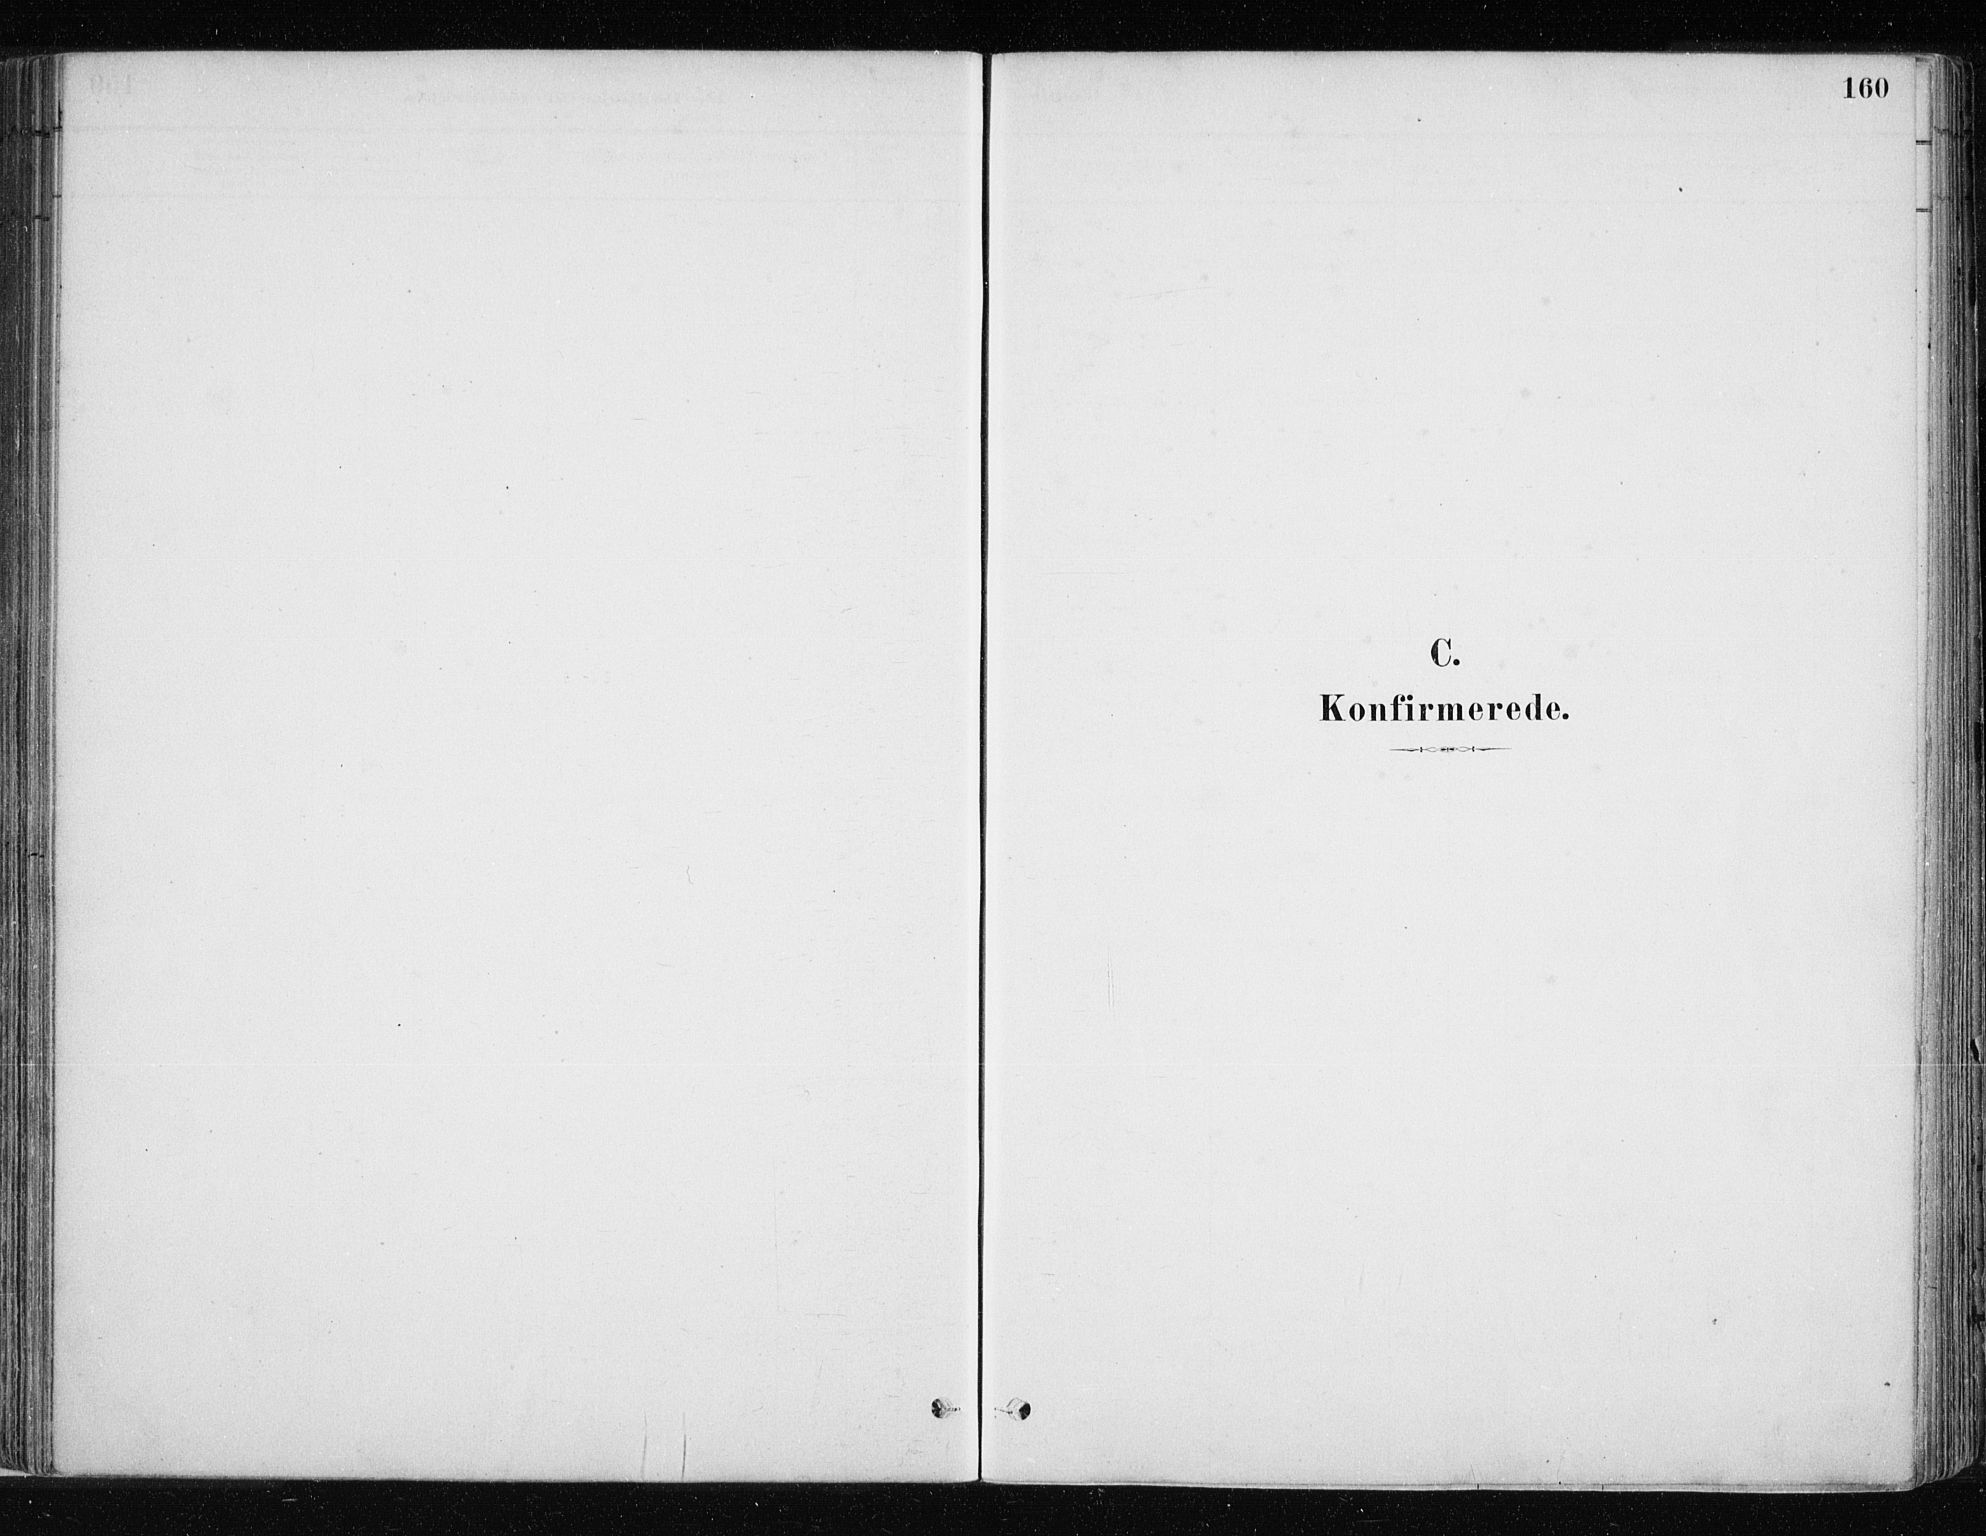 SATØ, Lyngen sokneprestembete, H/He/Hea/L0007kirke: Ministerialbok nr. 7, 1879-1890, s. 160